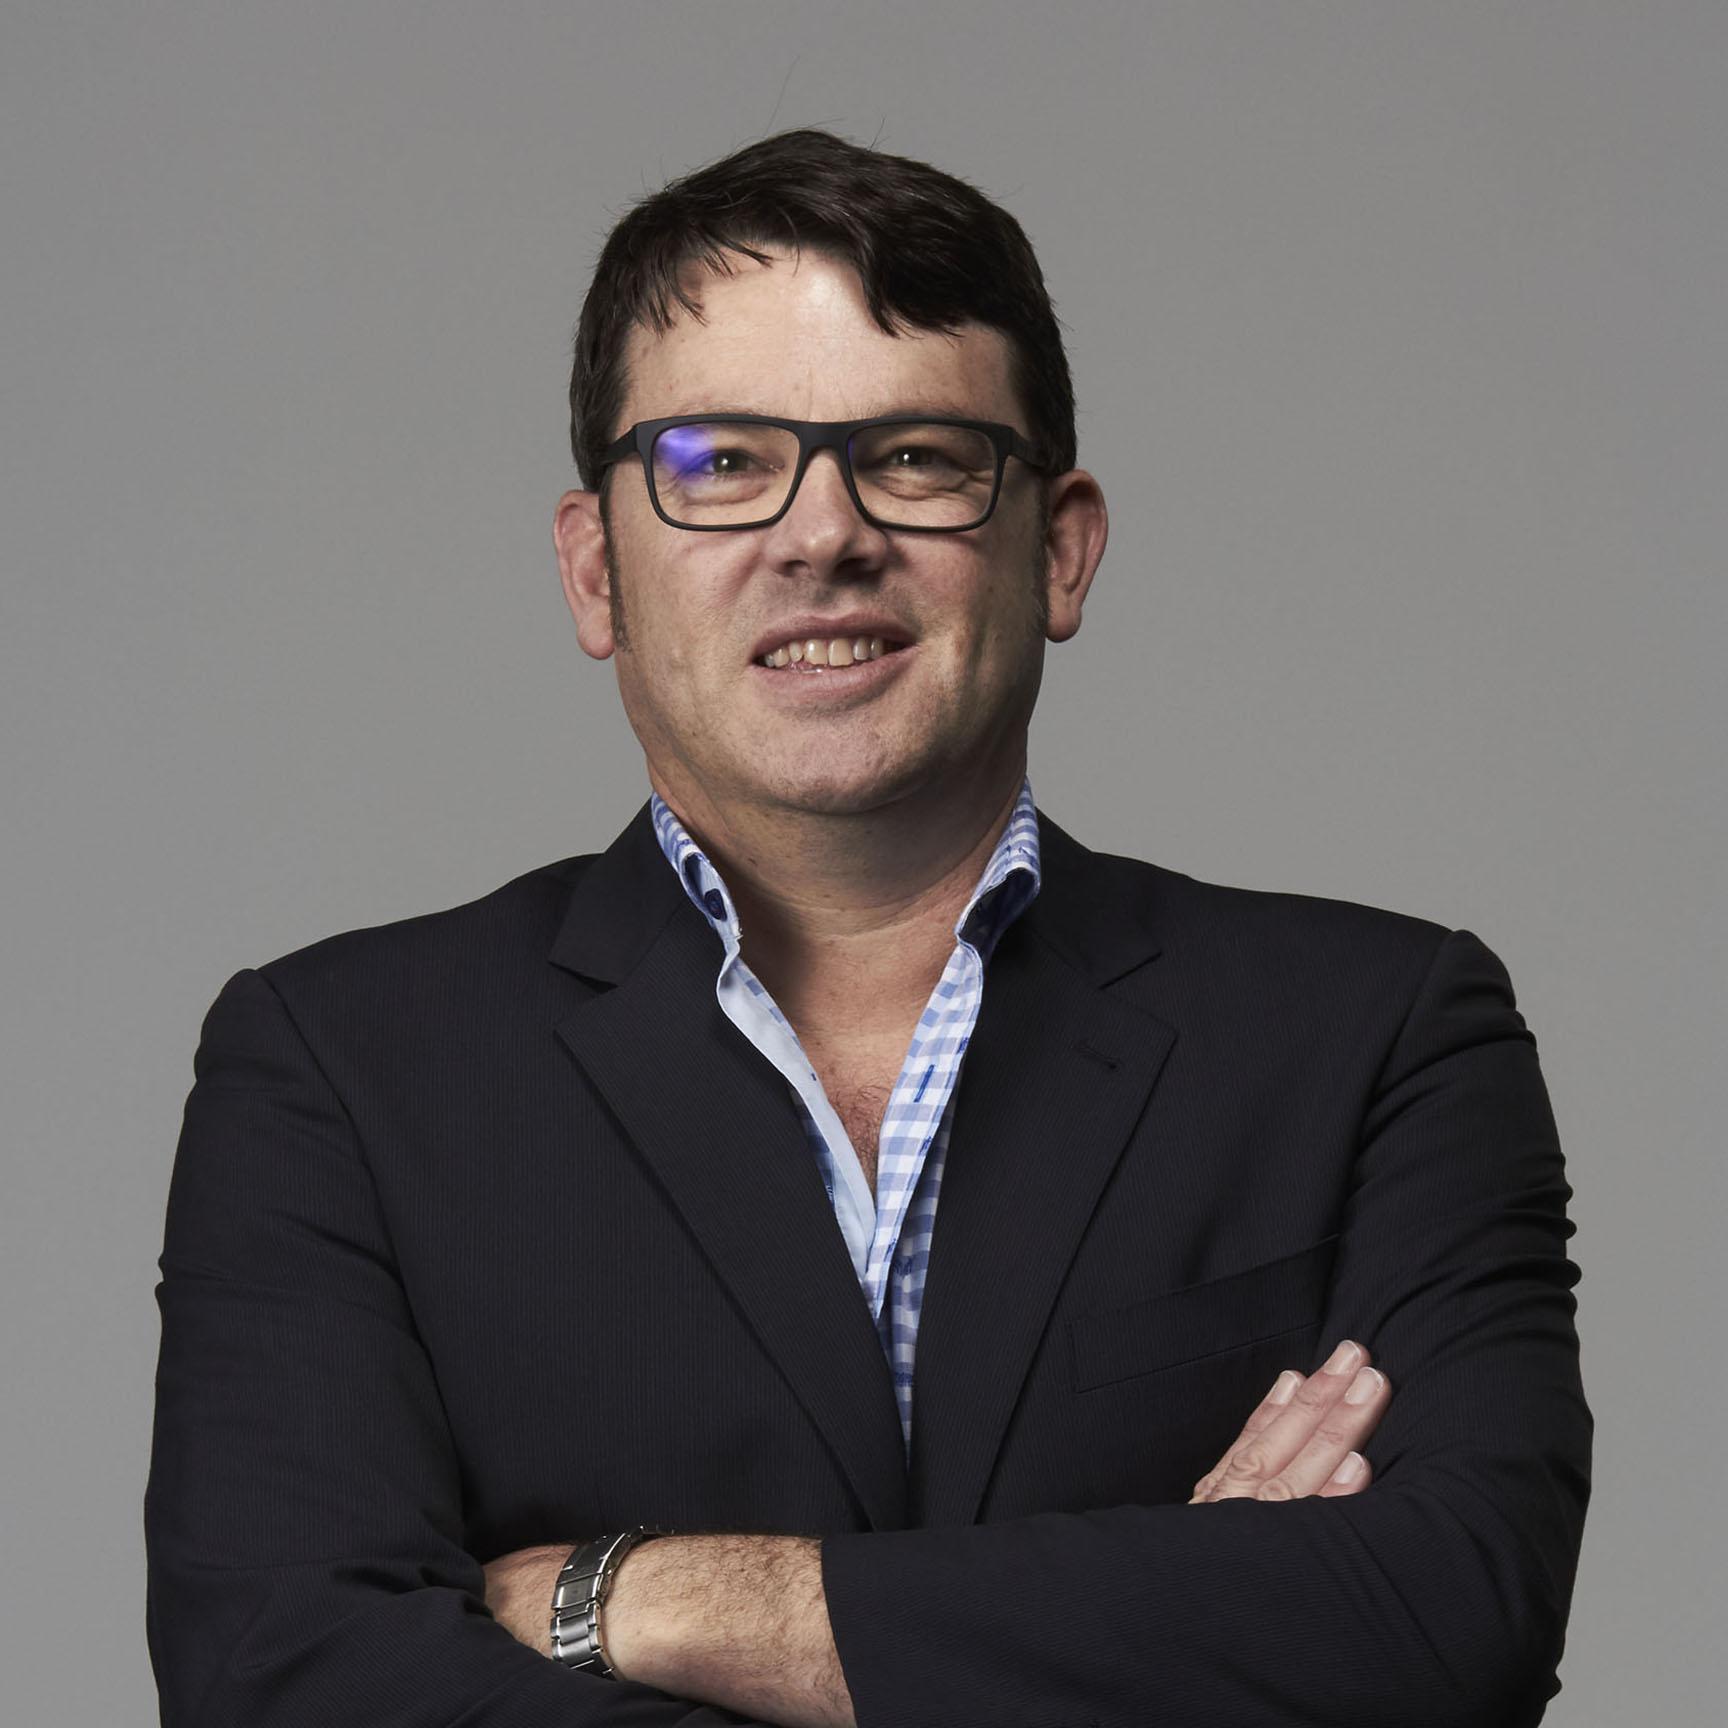 Mike Evans Executive Principal / Director